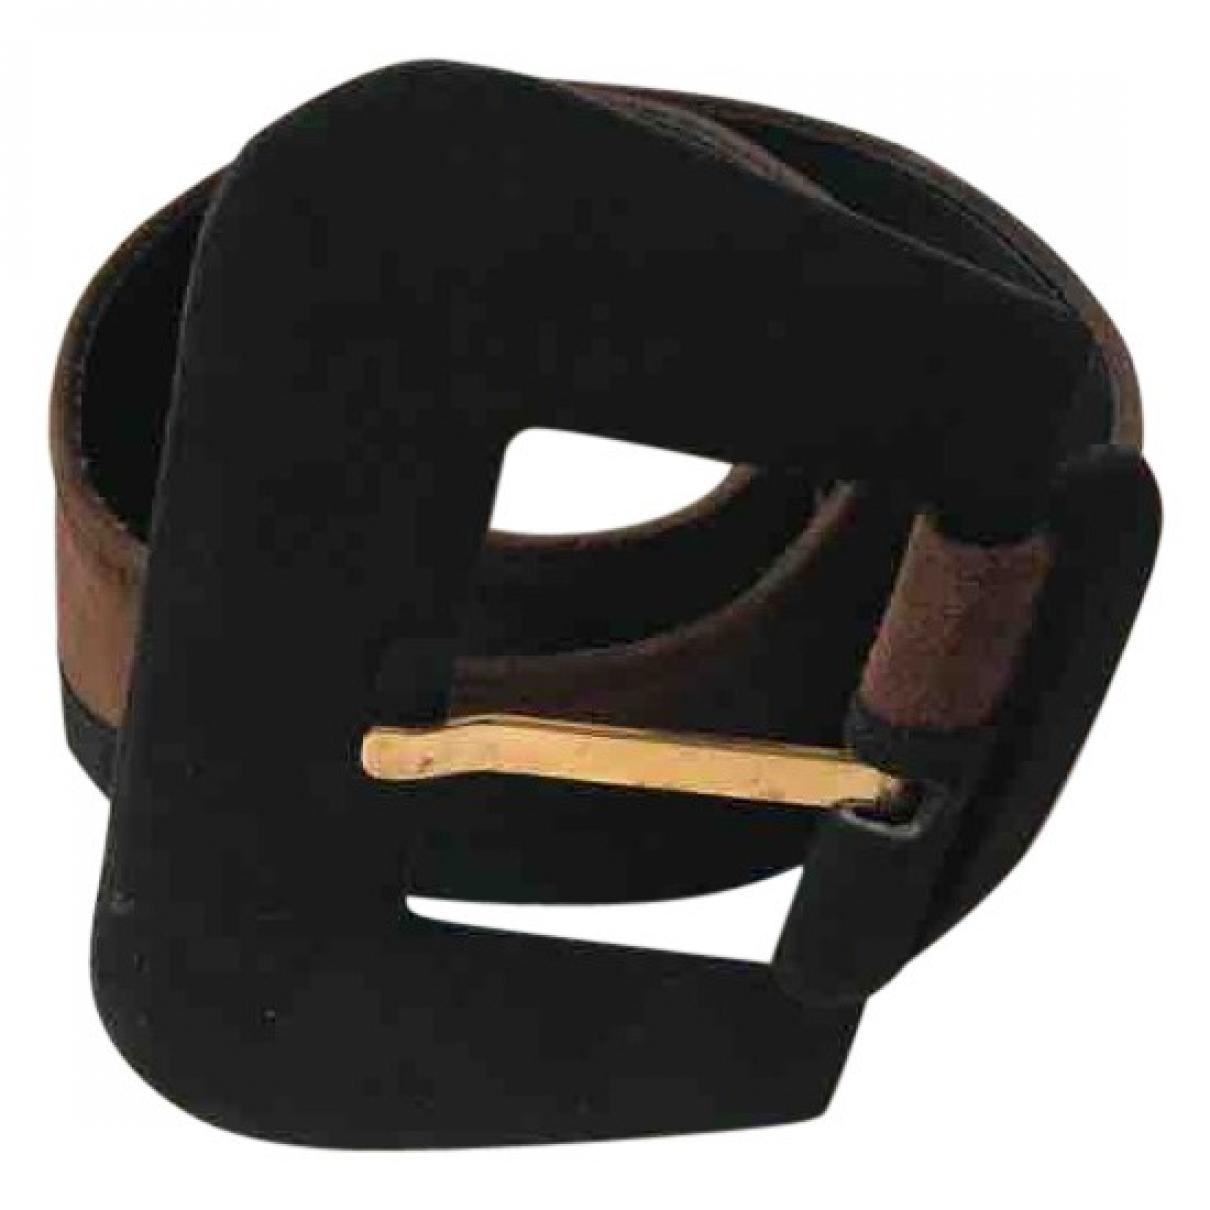 Cinturon Charles Jourdan